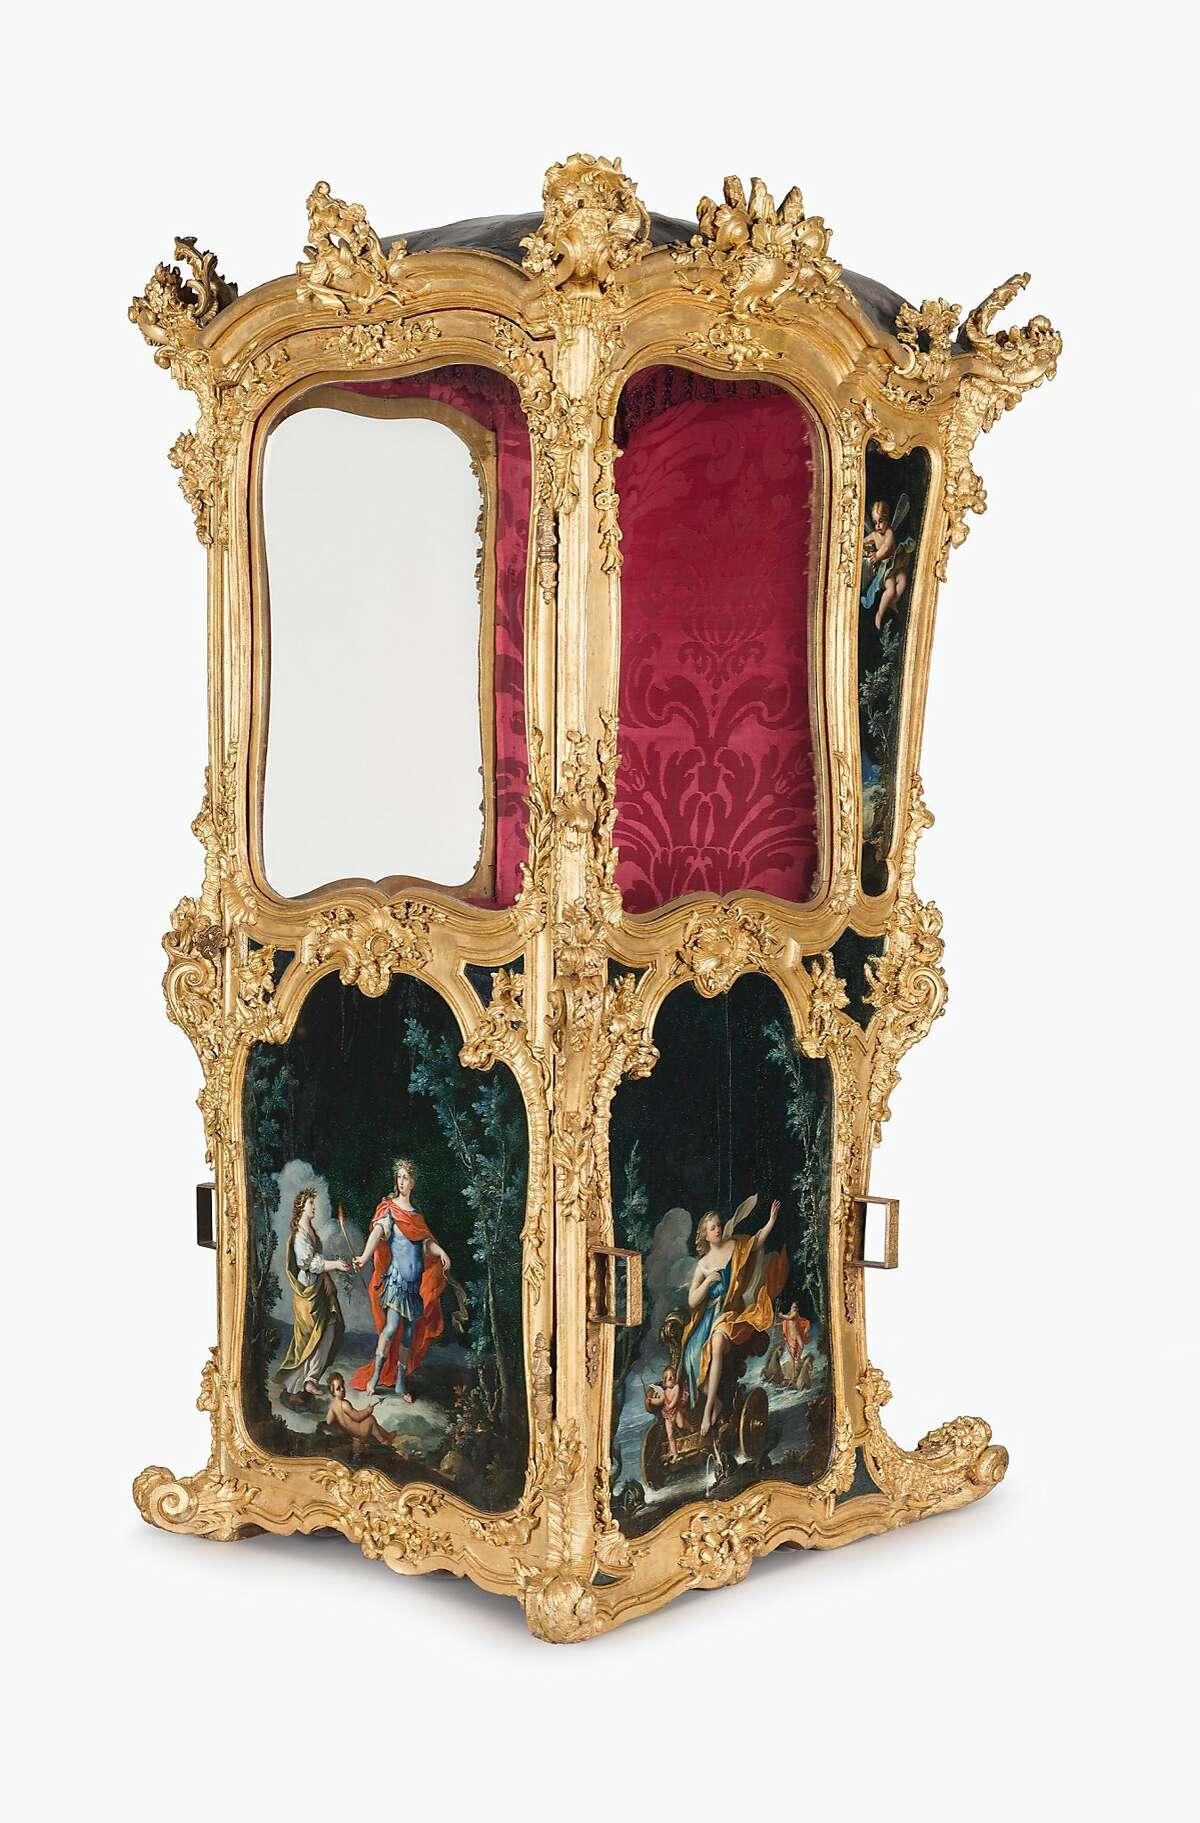 Sedan Chair, mid 18th century